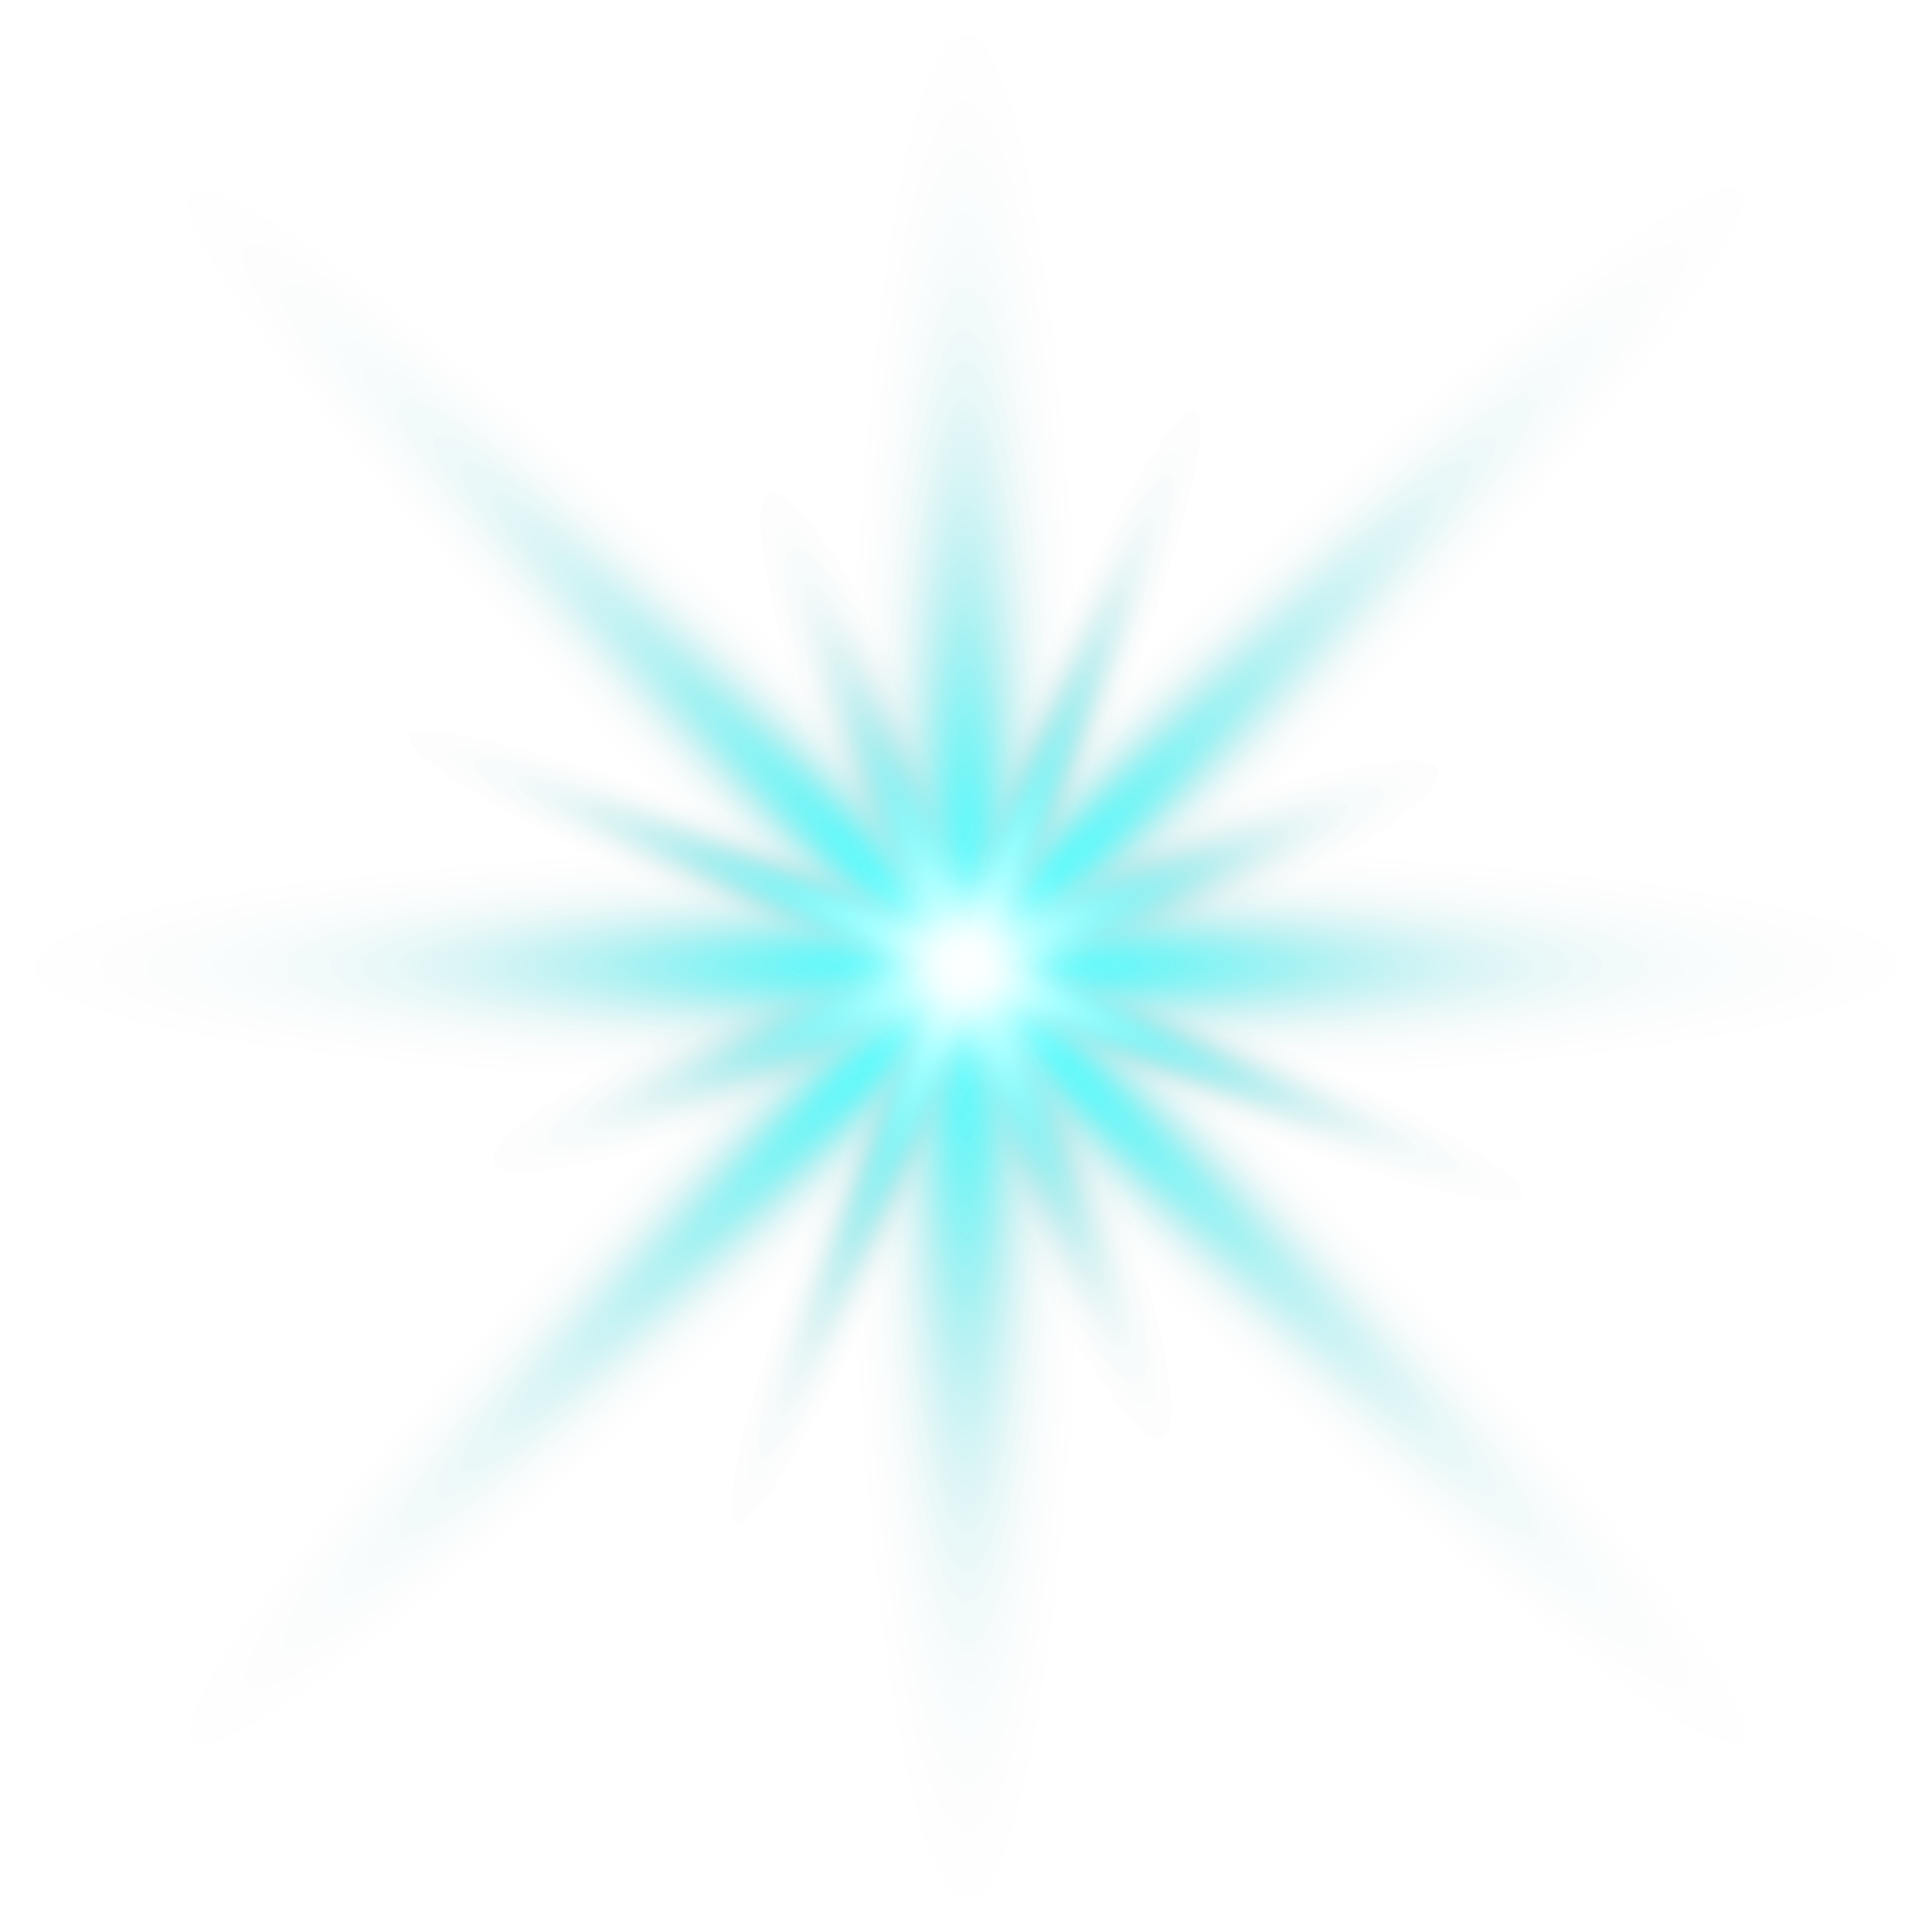 Streamers clipart light blue. Effect png clip art